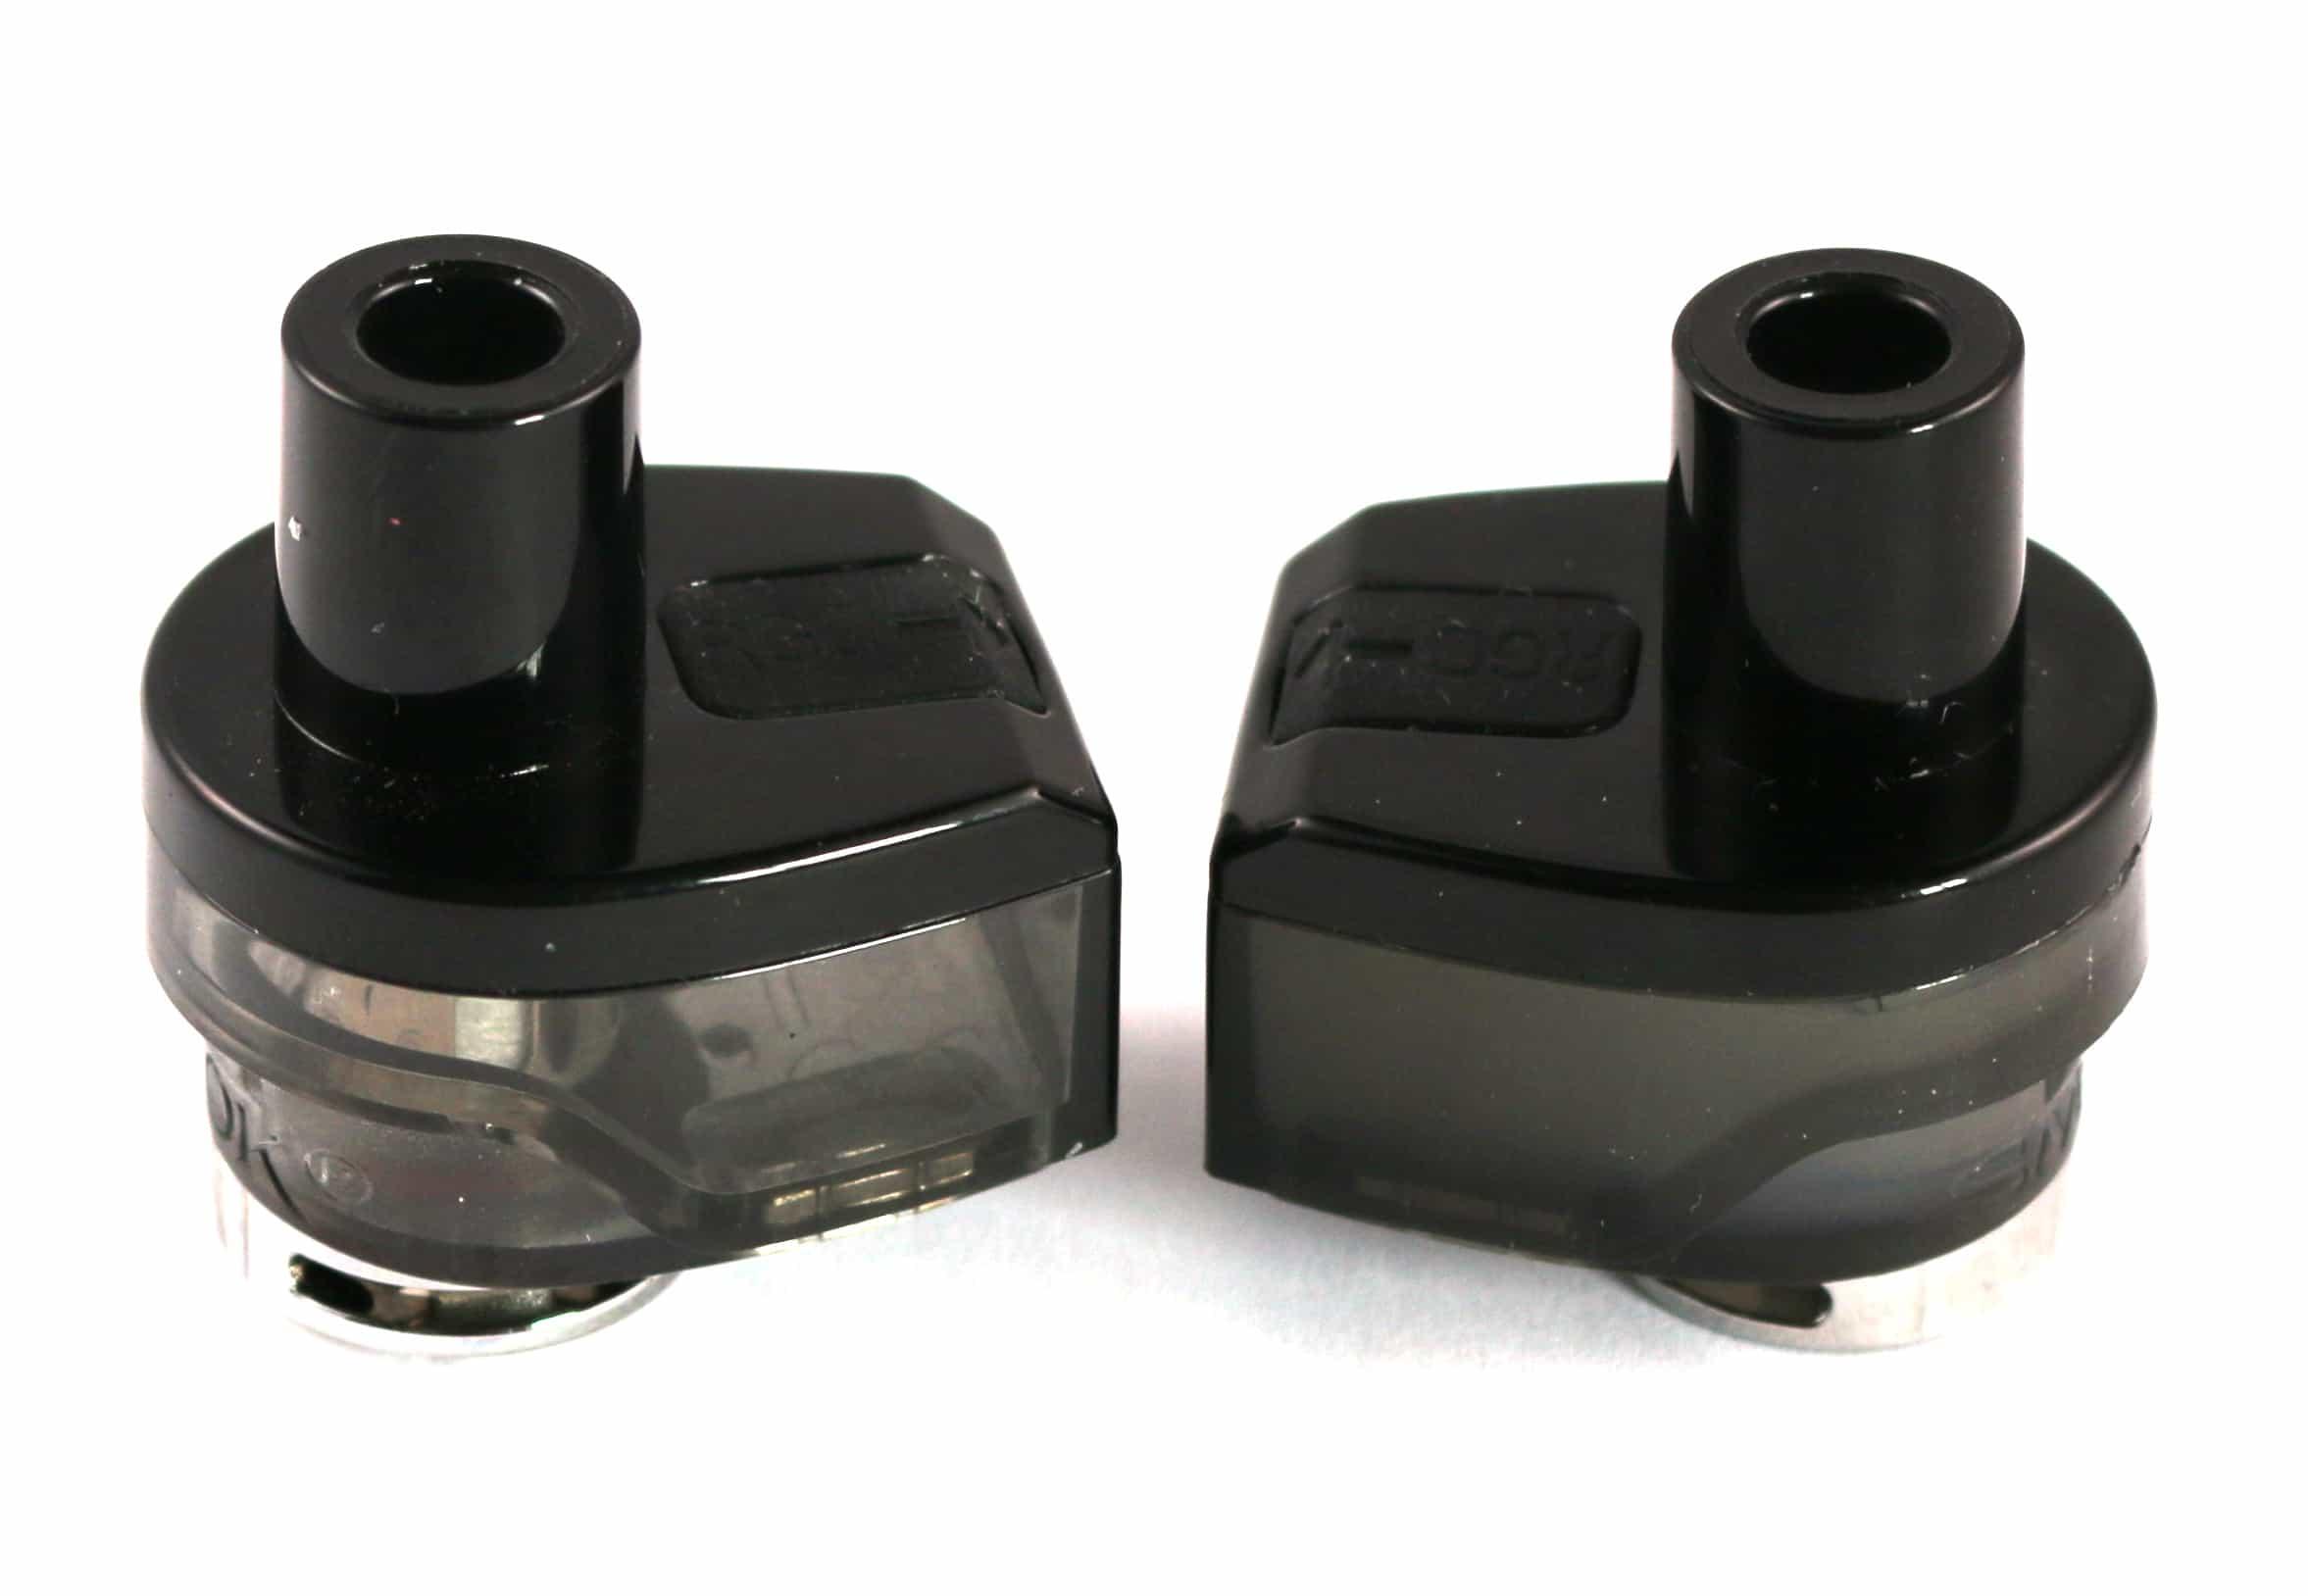 SMOK RPM80 Pro pods (2)